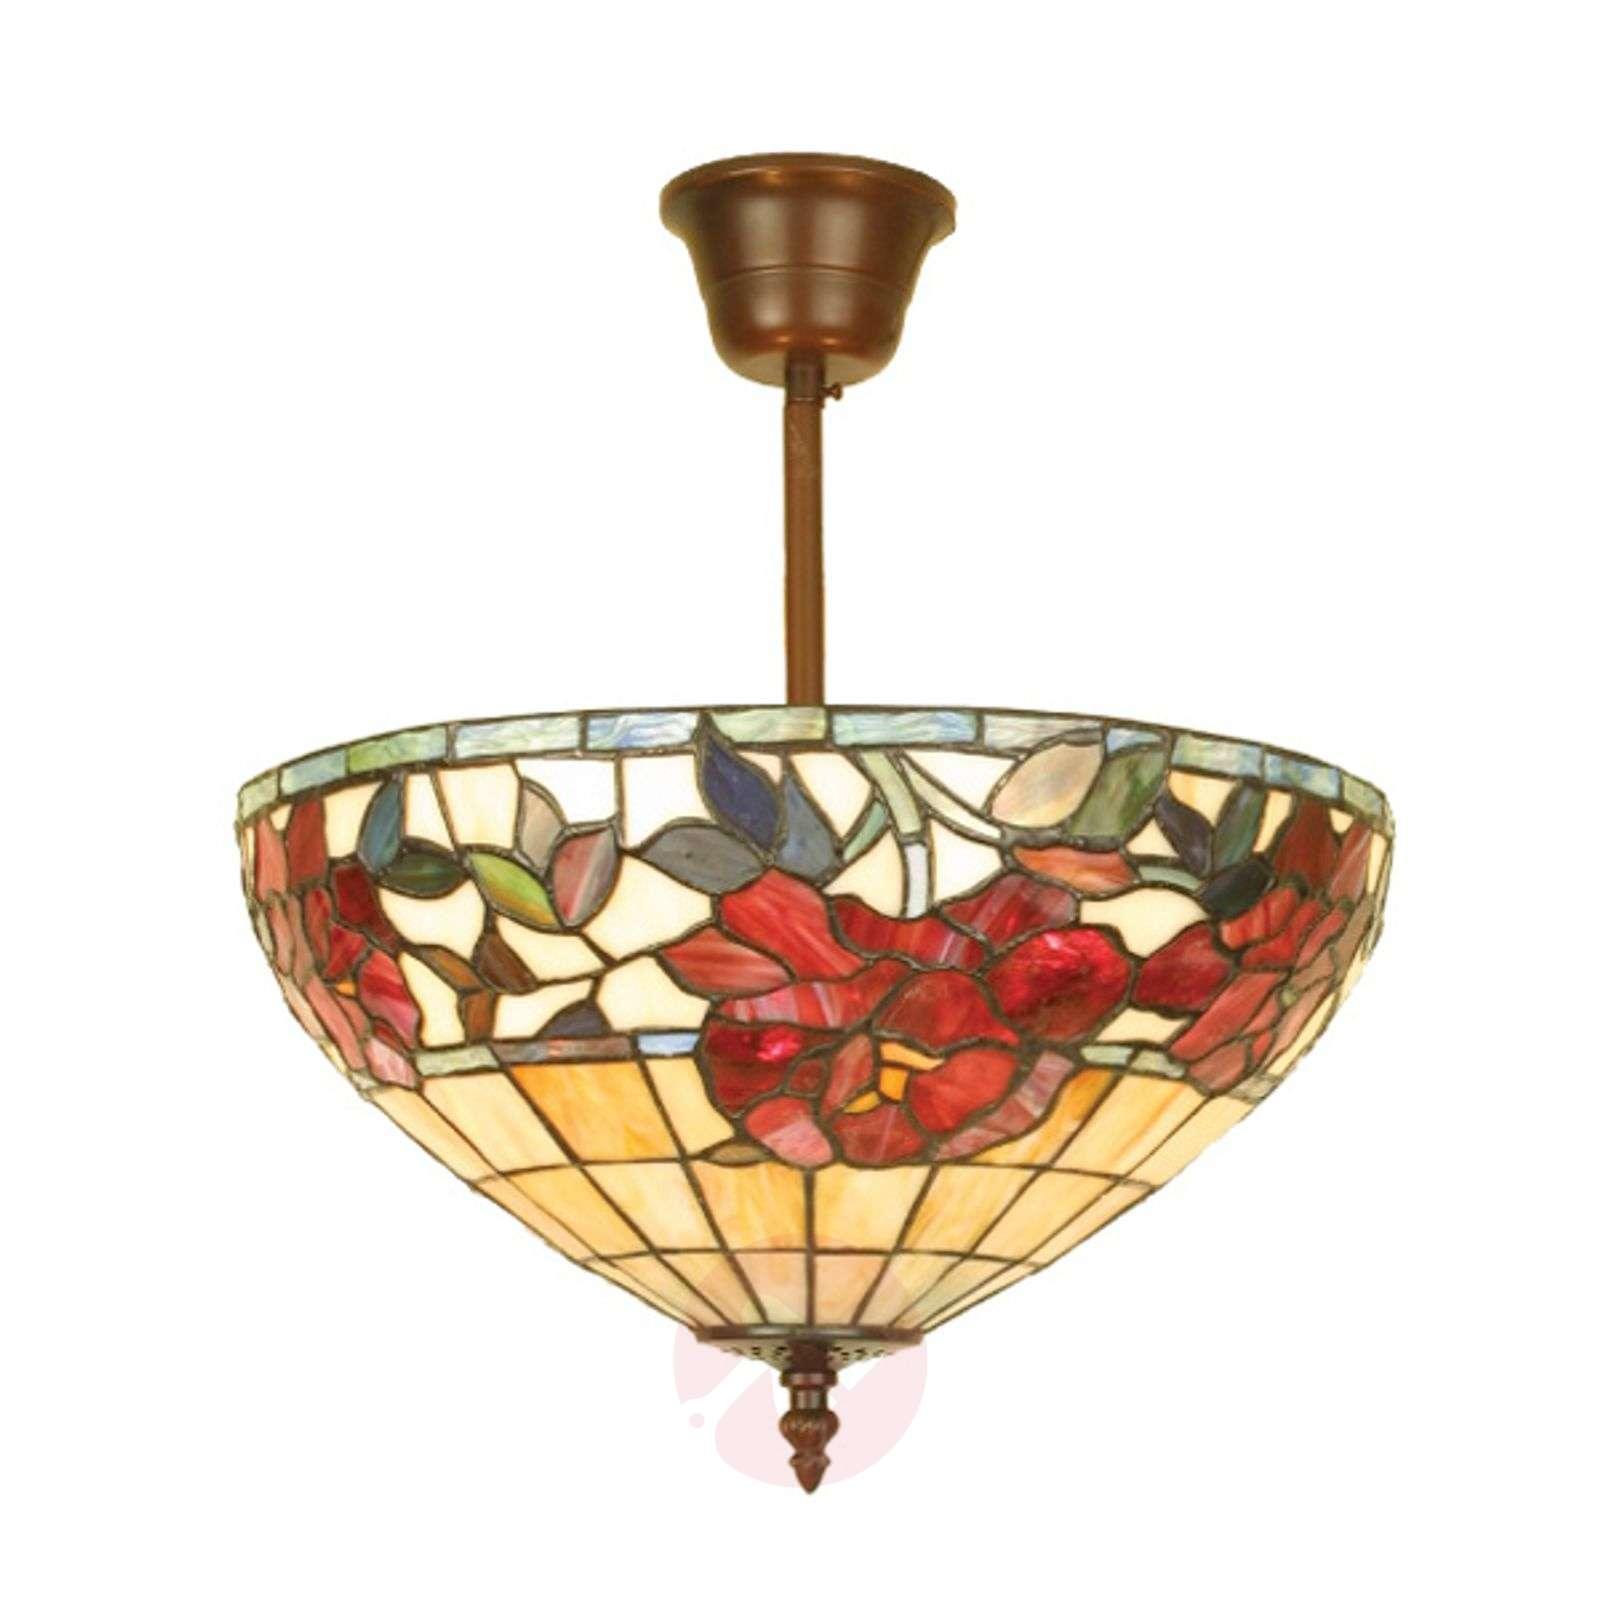 Ceiling light Finna, Tiffany-style-1032177-01